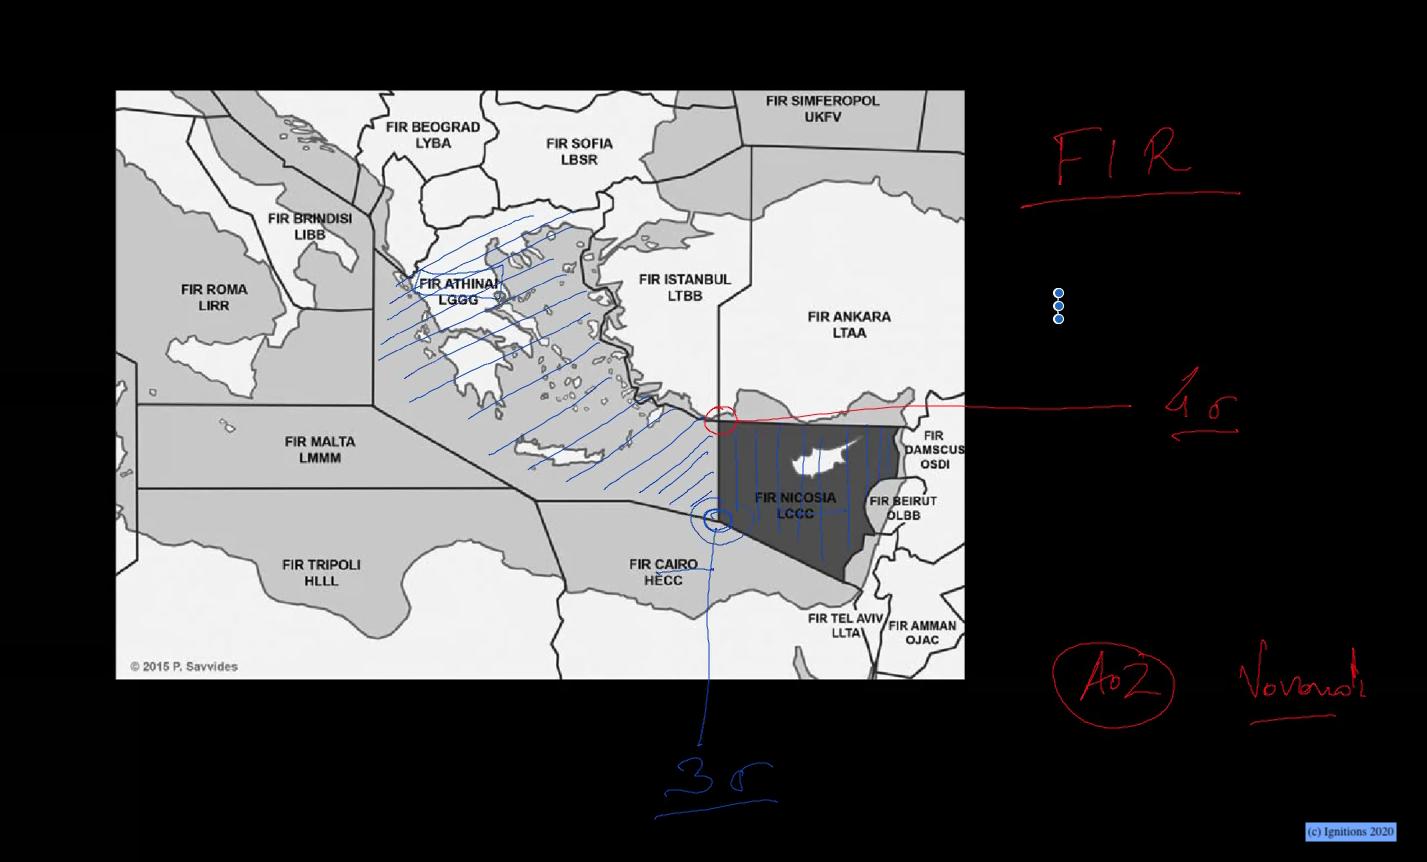 55616 - V - e-Masterclass: Πλάγια επίθεση και Μεσόγειος. (Dessin)